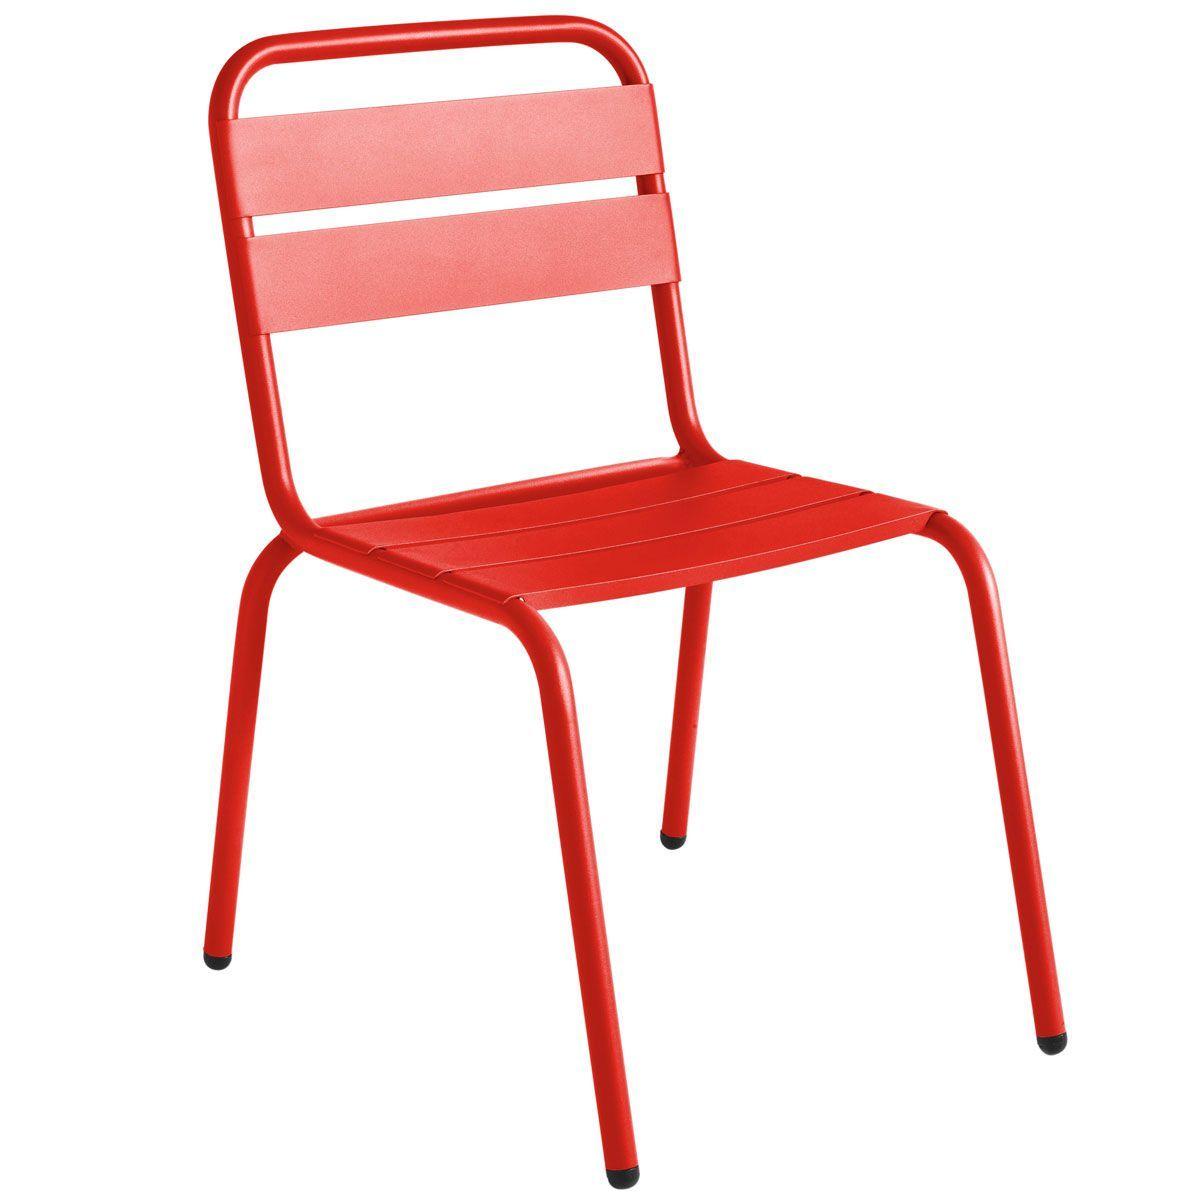 Chaise de jardin design Barceloneta ISIMAR | Mobilier jardin ...